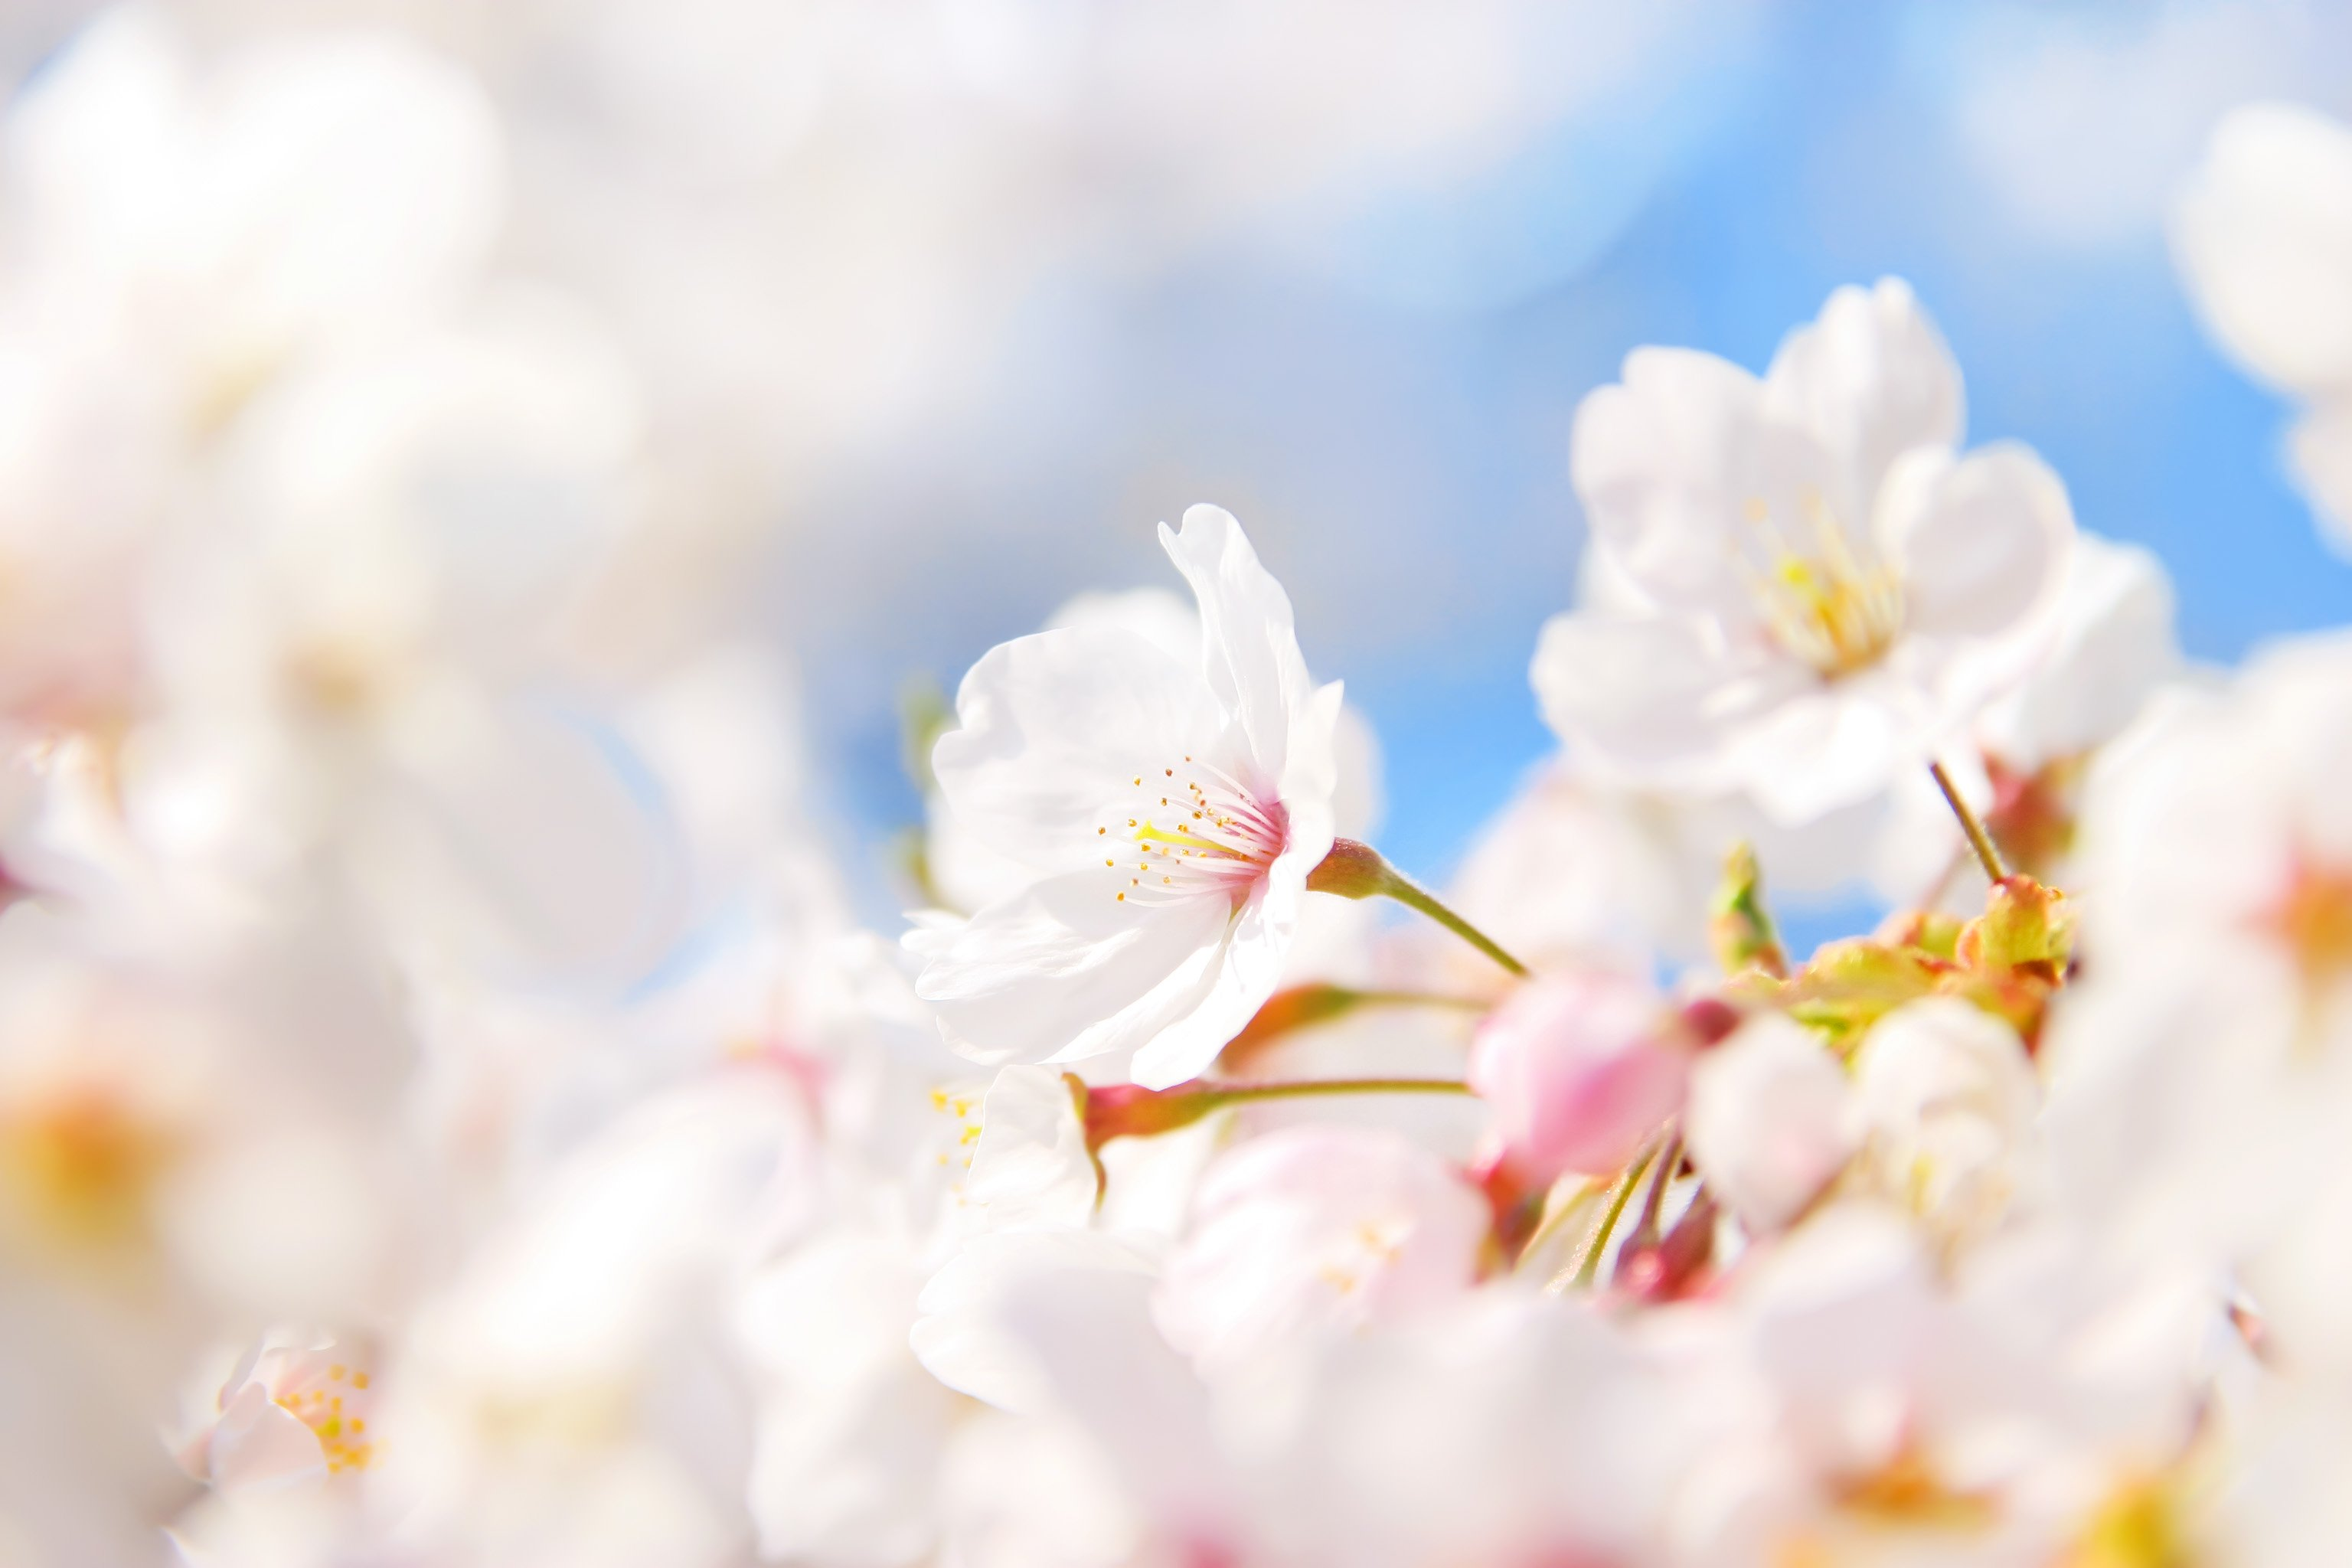 xcherry-blossom_00004.jpg.pagespeed.ic.1yJLHbuJ85